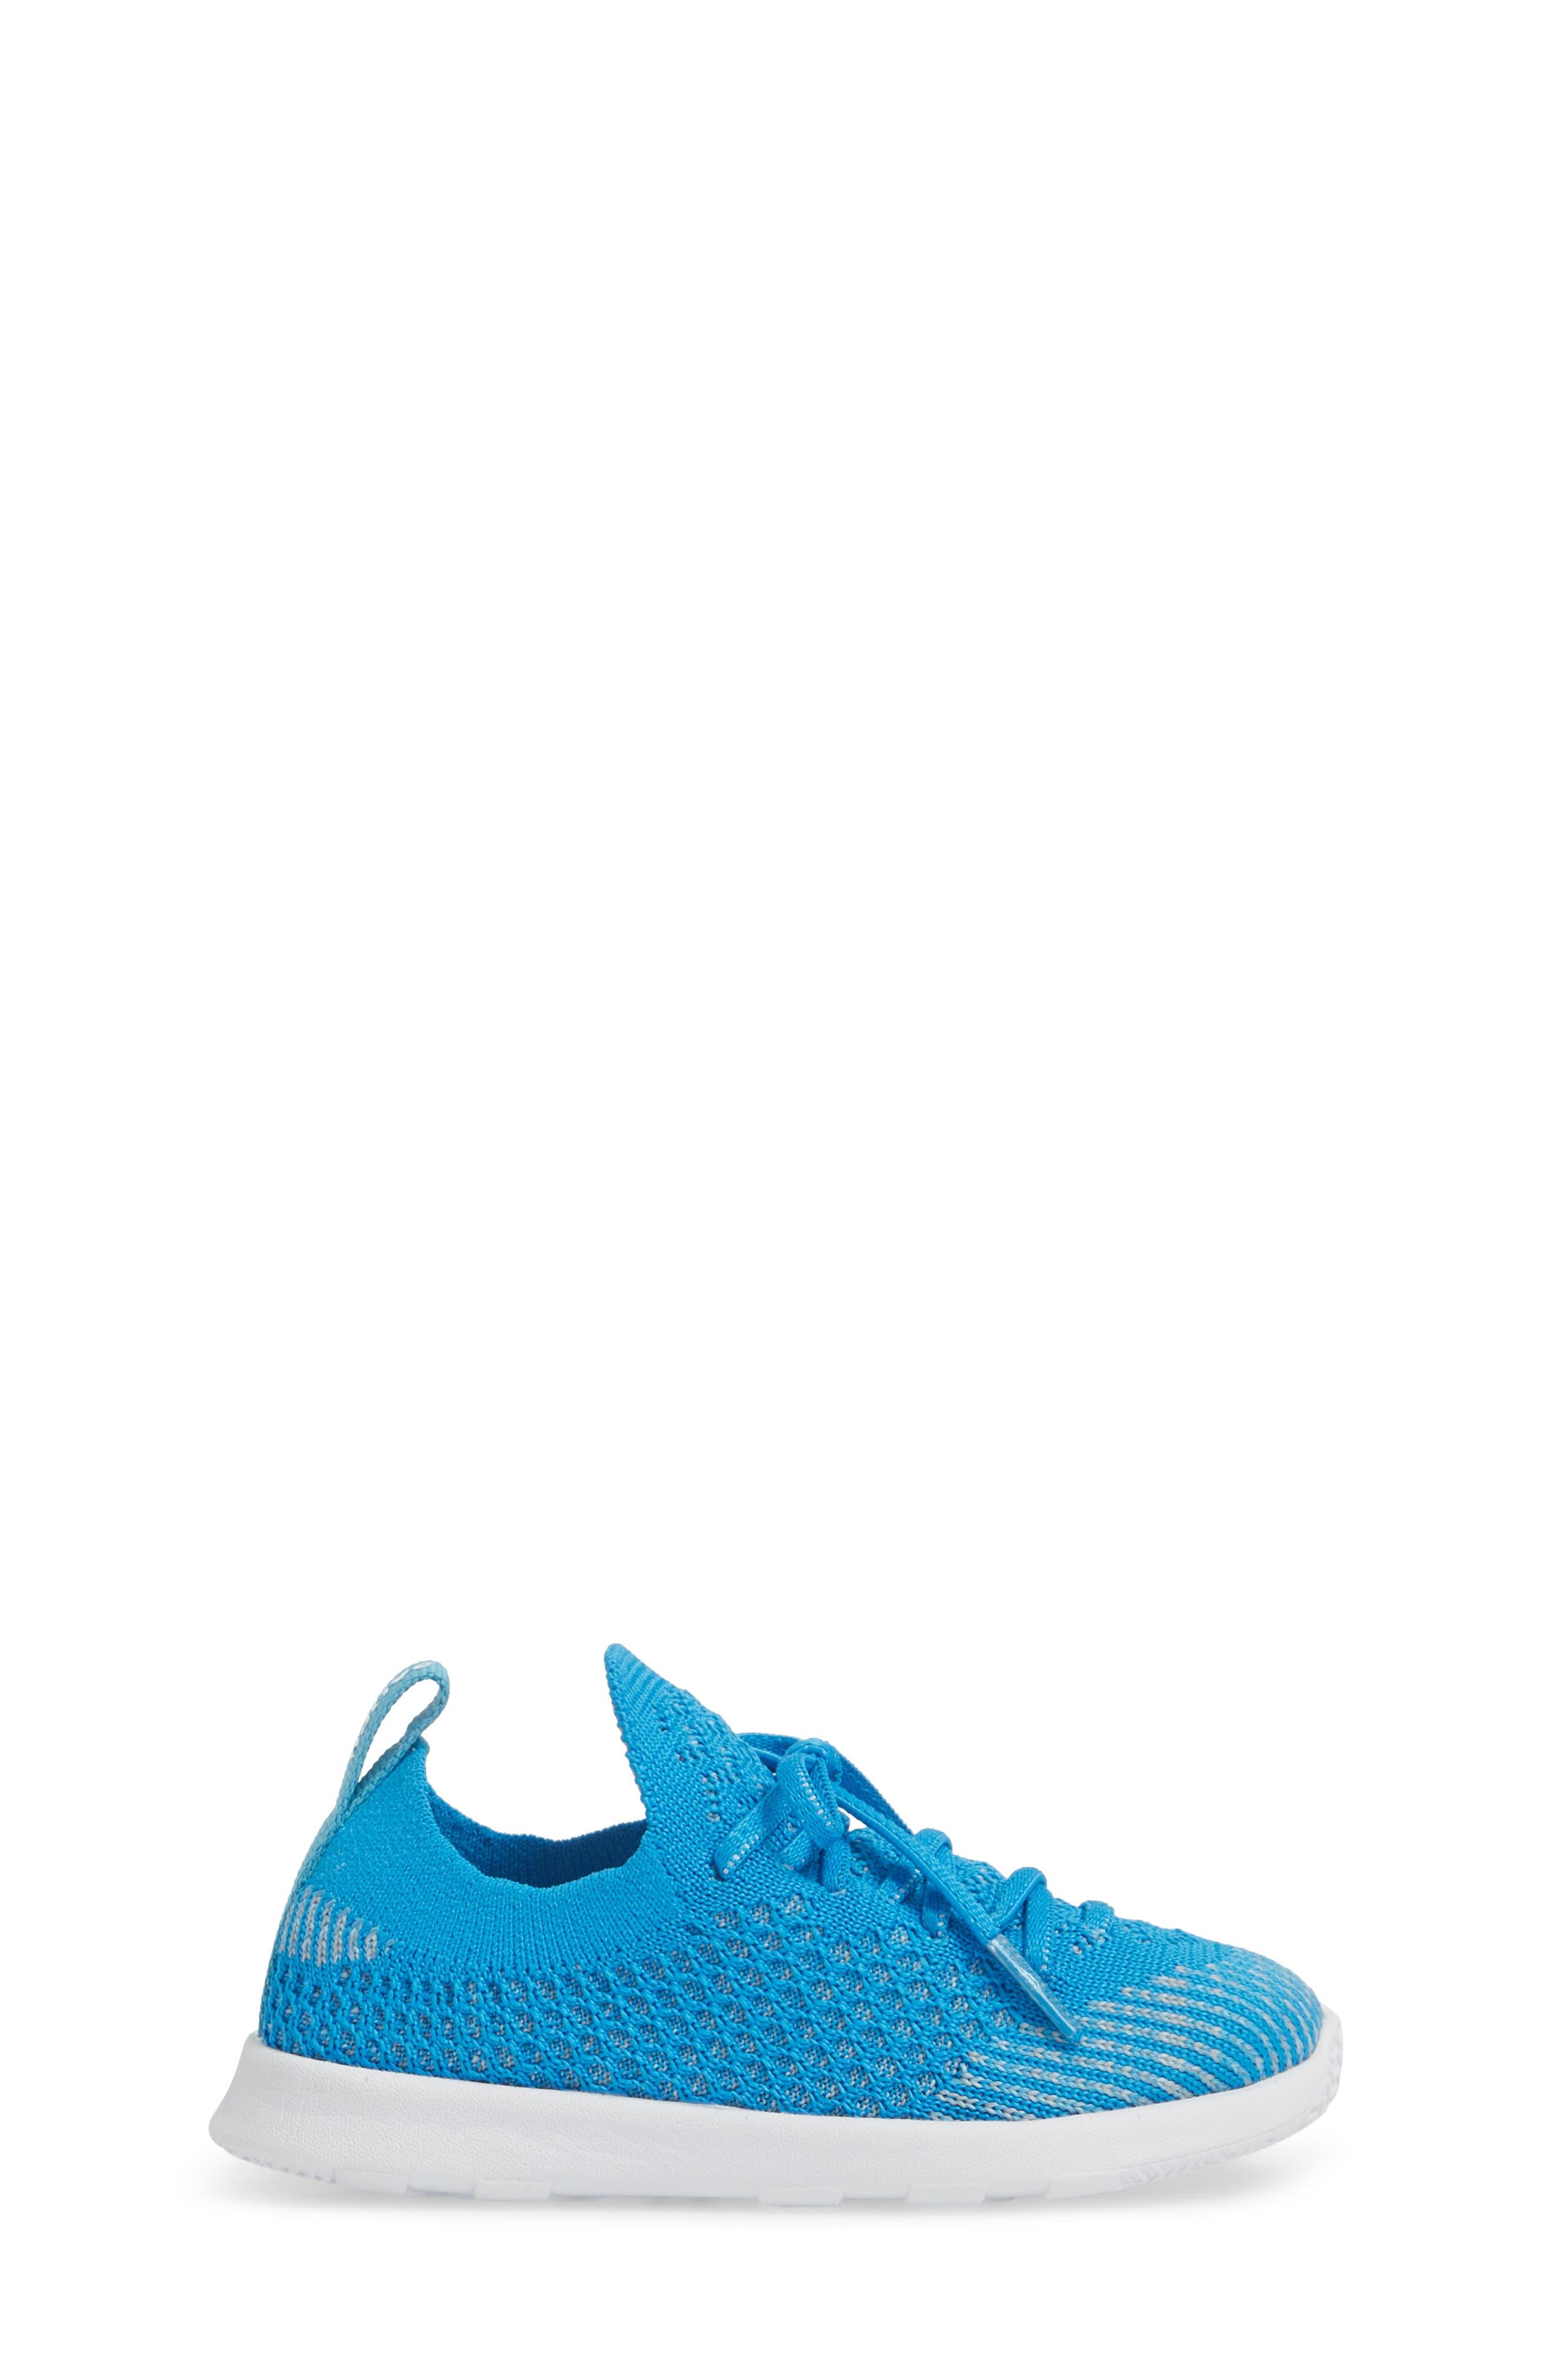 AP Mercury LiteKnit Sneaker,                             Alternate thumbnail 3, color,                             Wave Blue/ Shell White